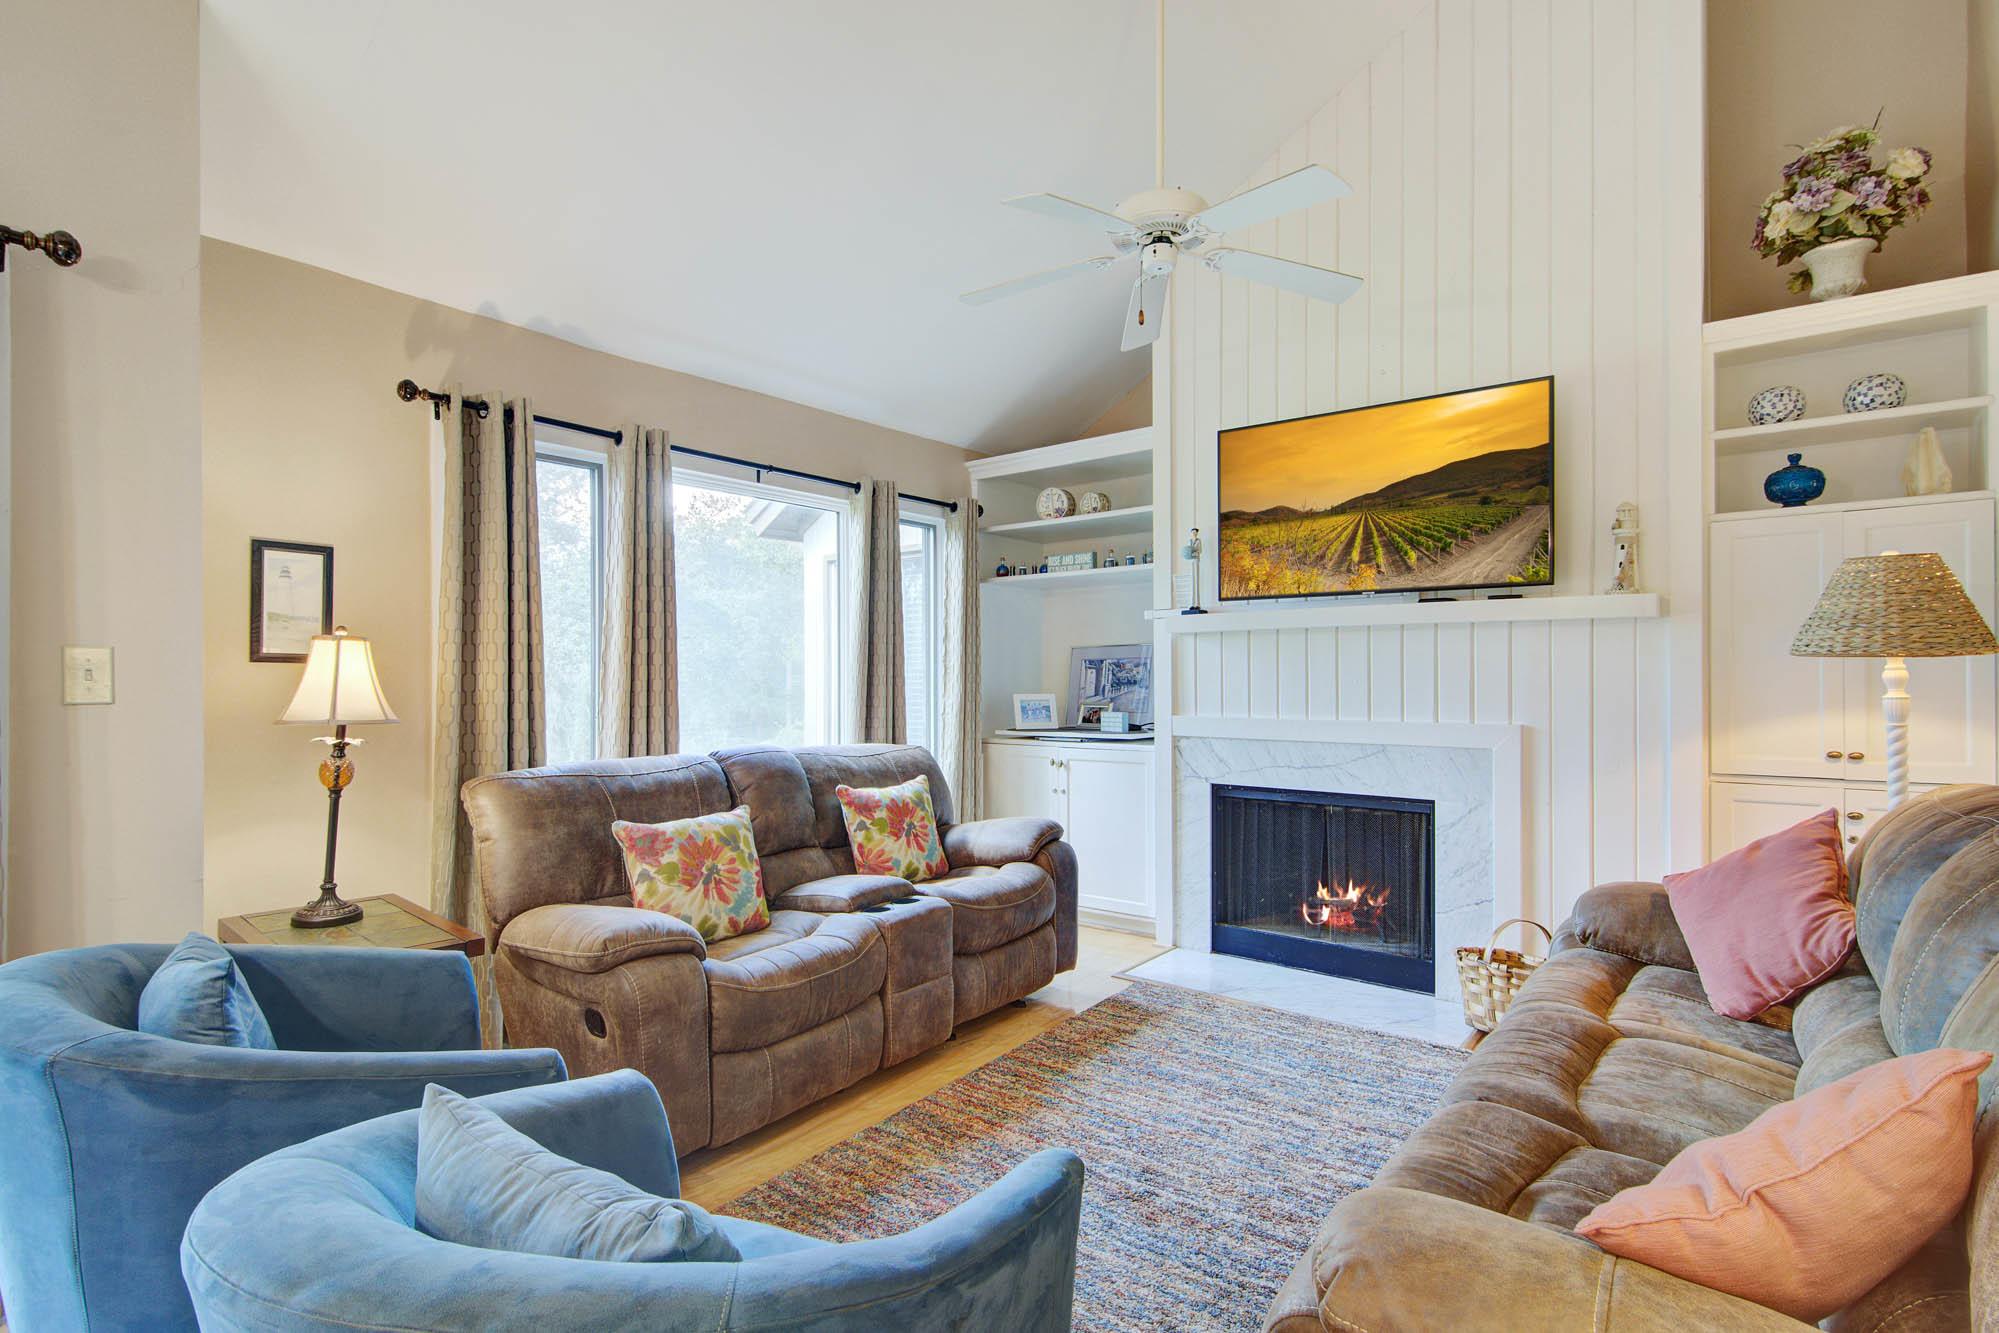 Kiawah Island Homes For Sale - 4504 Park Lake, Kiawah Island, SC - 0